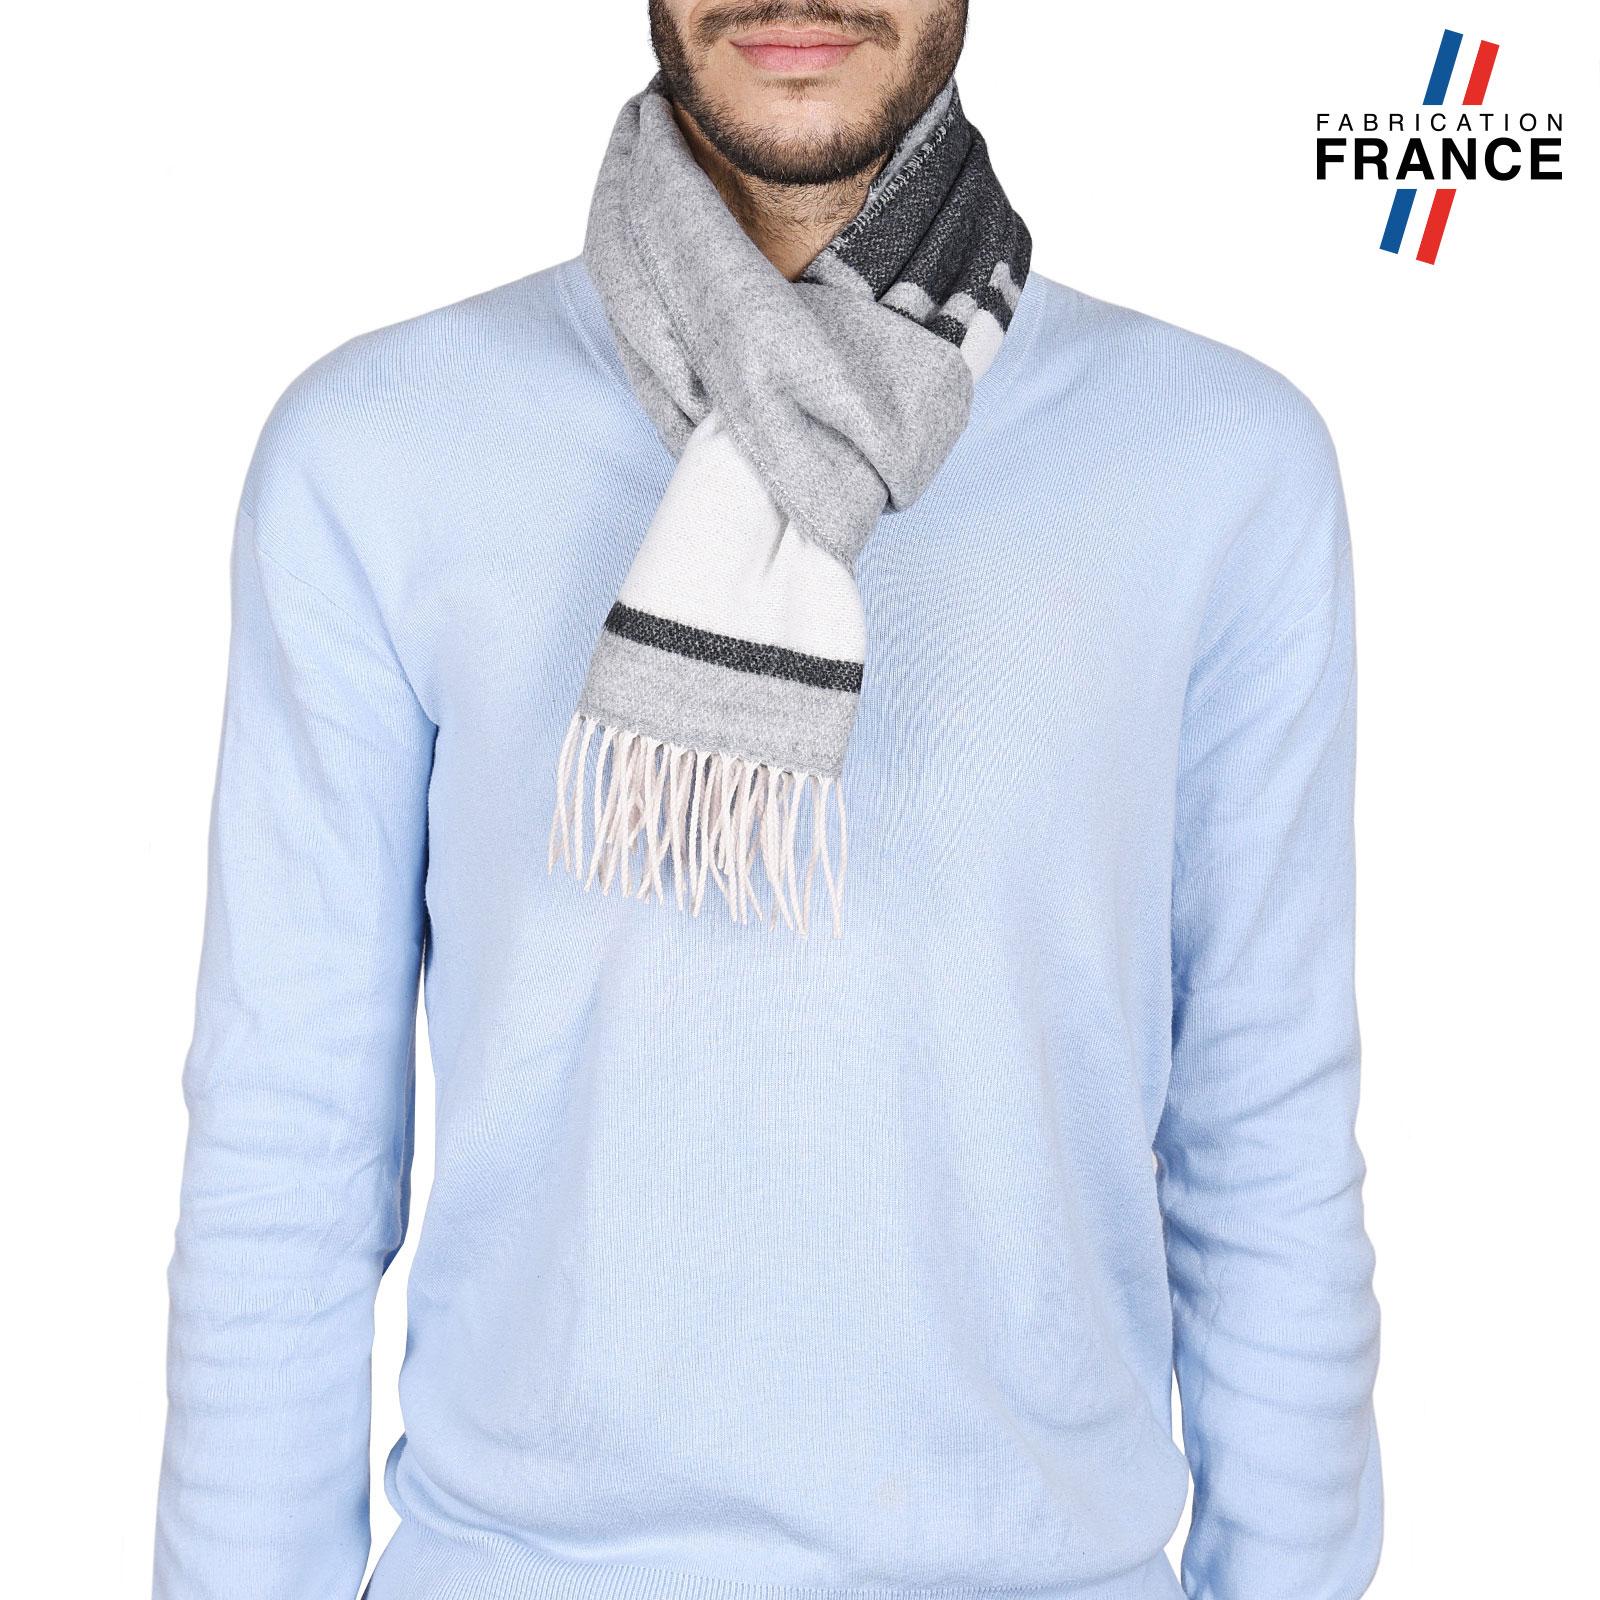 AT-03745-blanc-gris-echarpe-homme-blanche-et-grise-V16